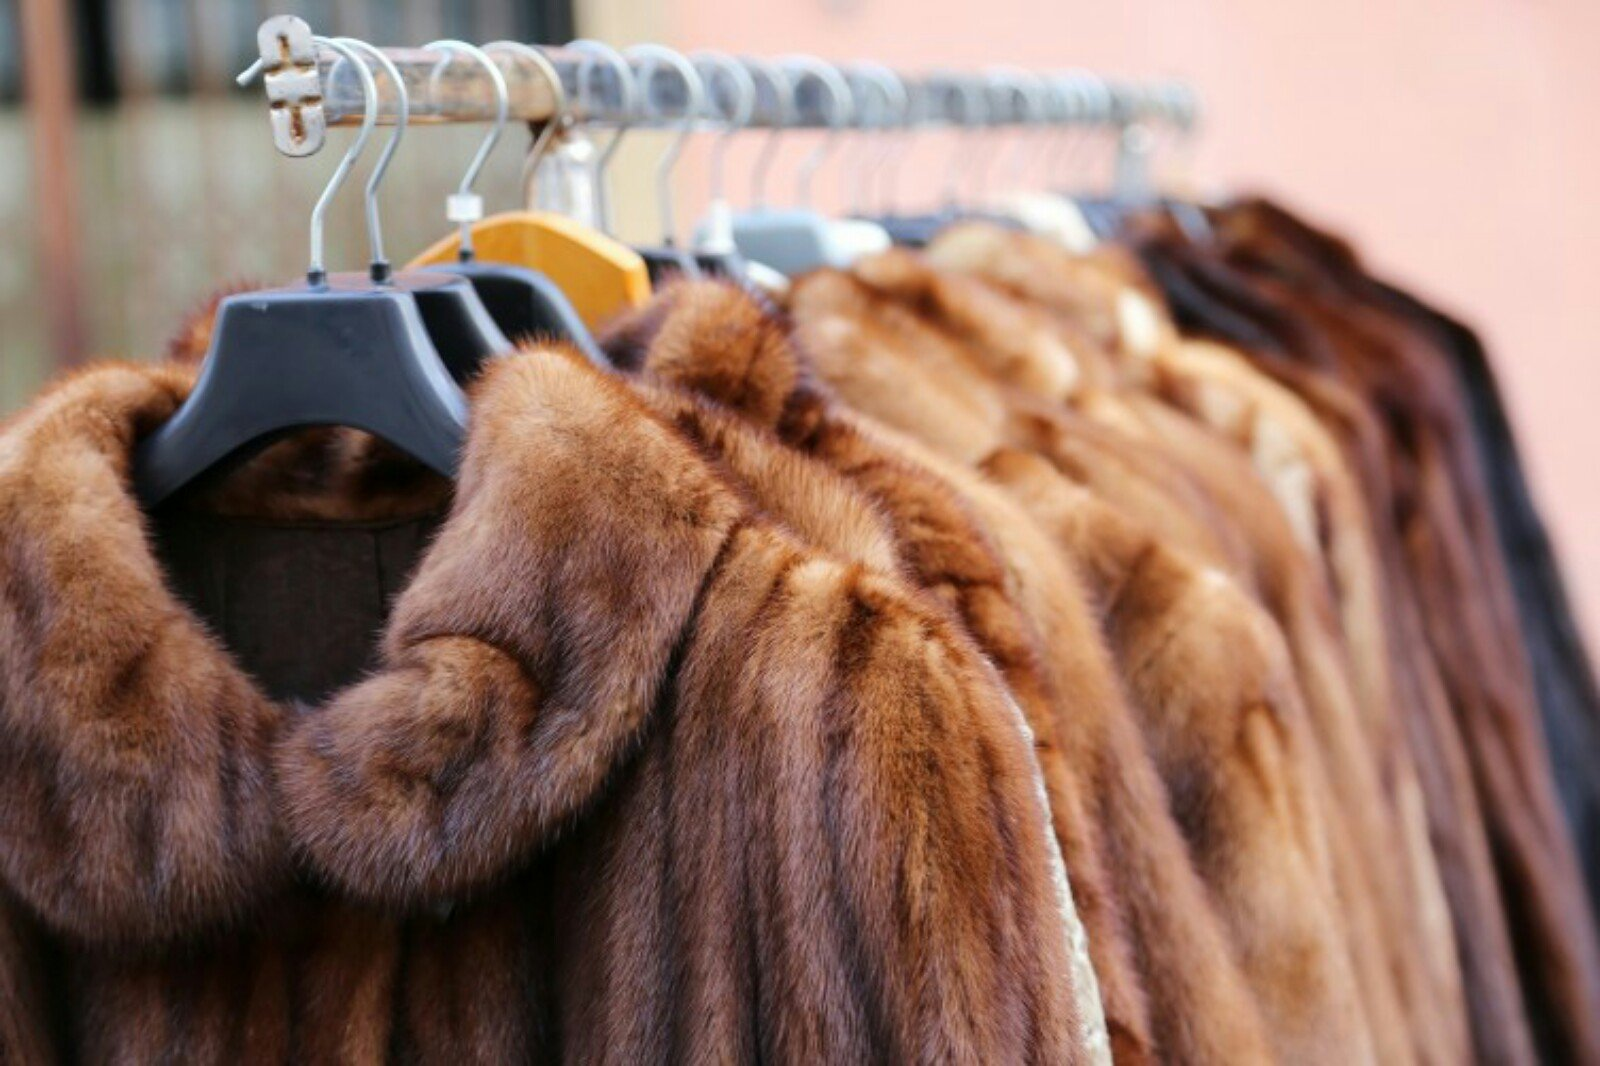 Шоппинг-тур по фабричным магазинам кожи и меха